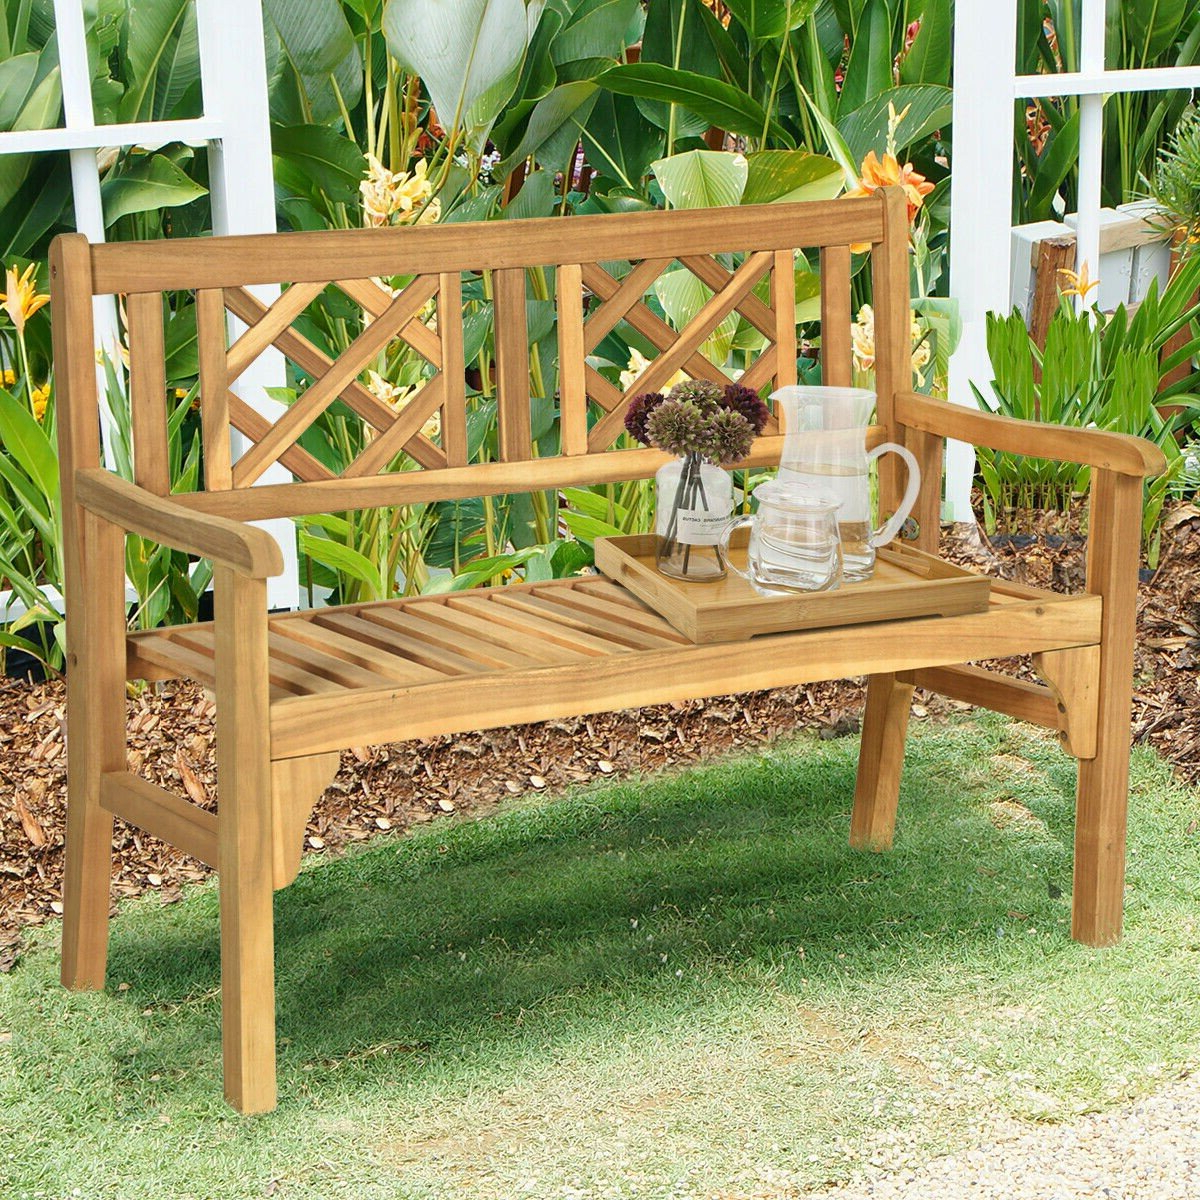 2019 Maliyah Wooden Garden Benches For Maulik Wooden Garden Bench (View 3 of 30)